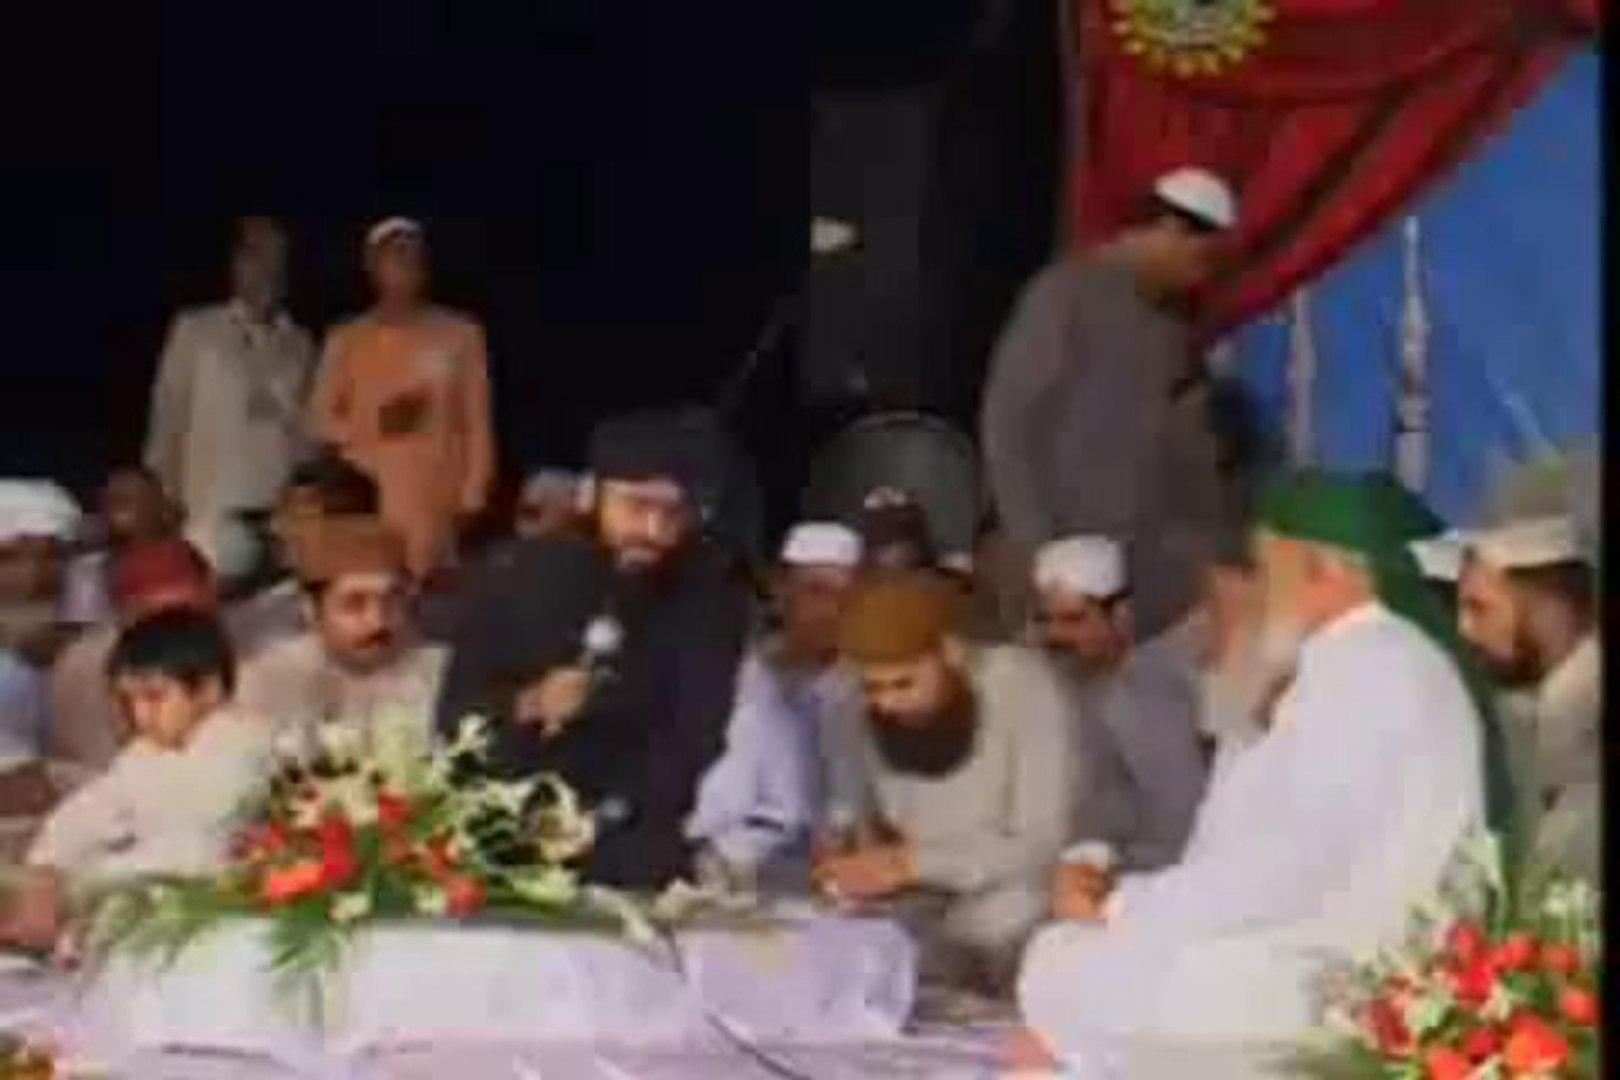 Ek Mein Hi Nahi Un Per Qurban Zamana Hai Ghulam Mustafa Qadri & Muhamamd Owais Raza Qadri Latest